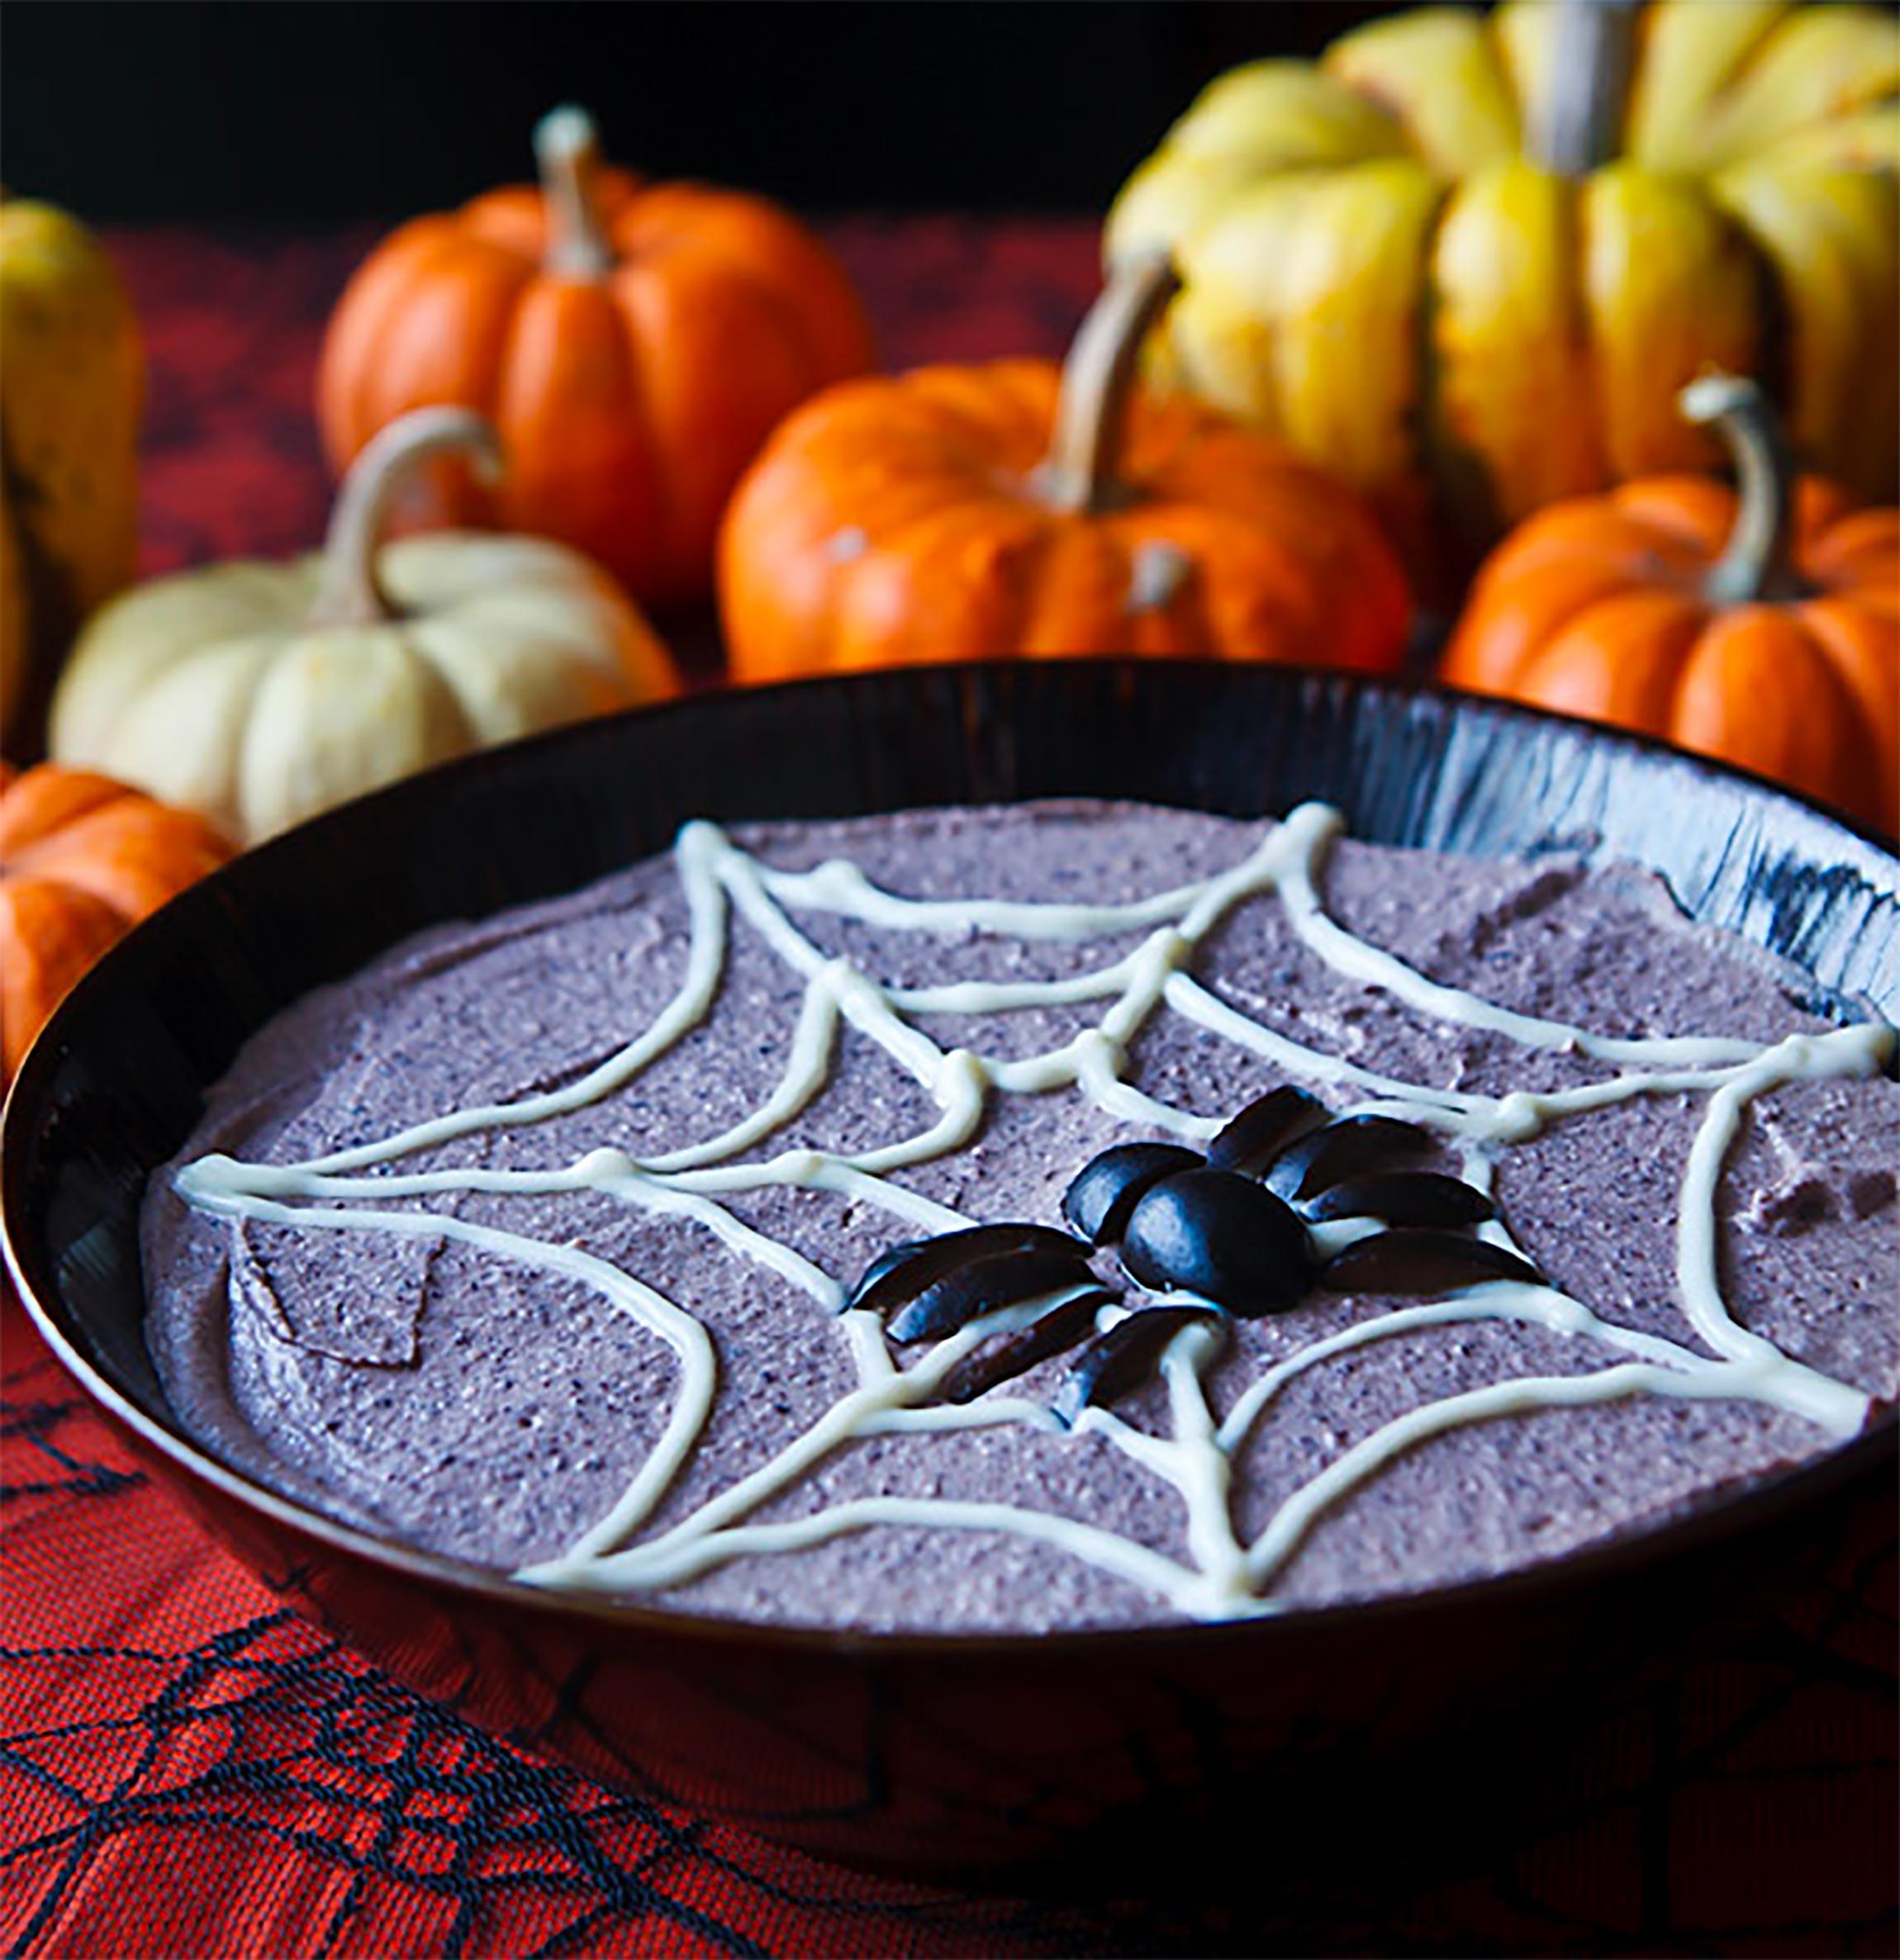 Healthy Halloween Snacks & Treats: Spooky Black Bean Hummus